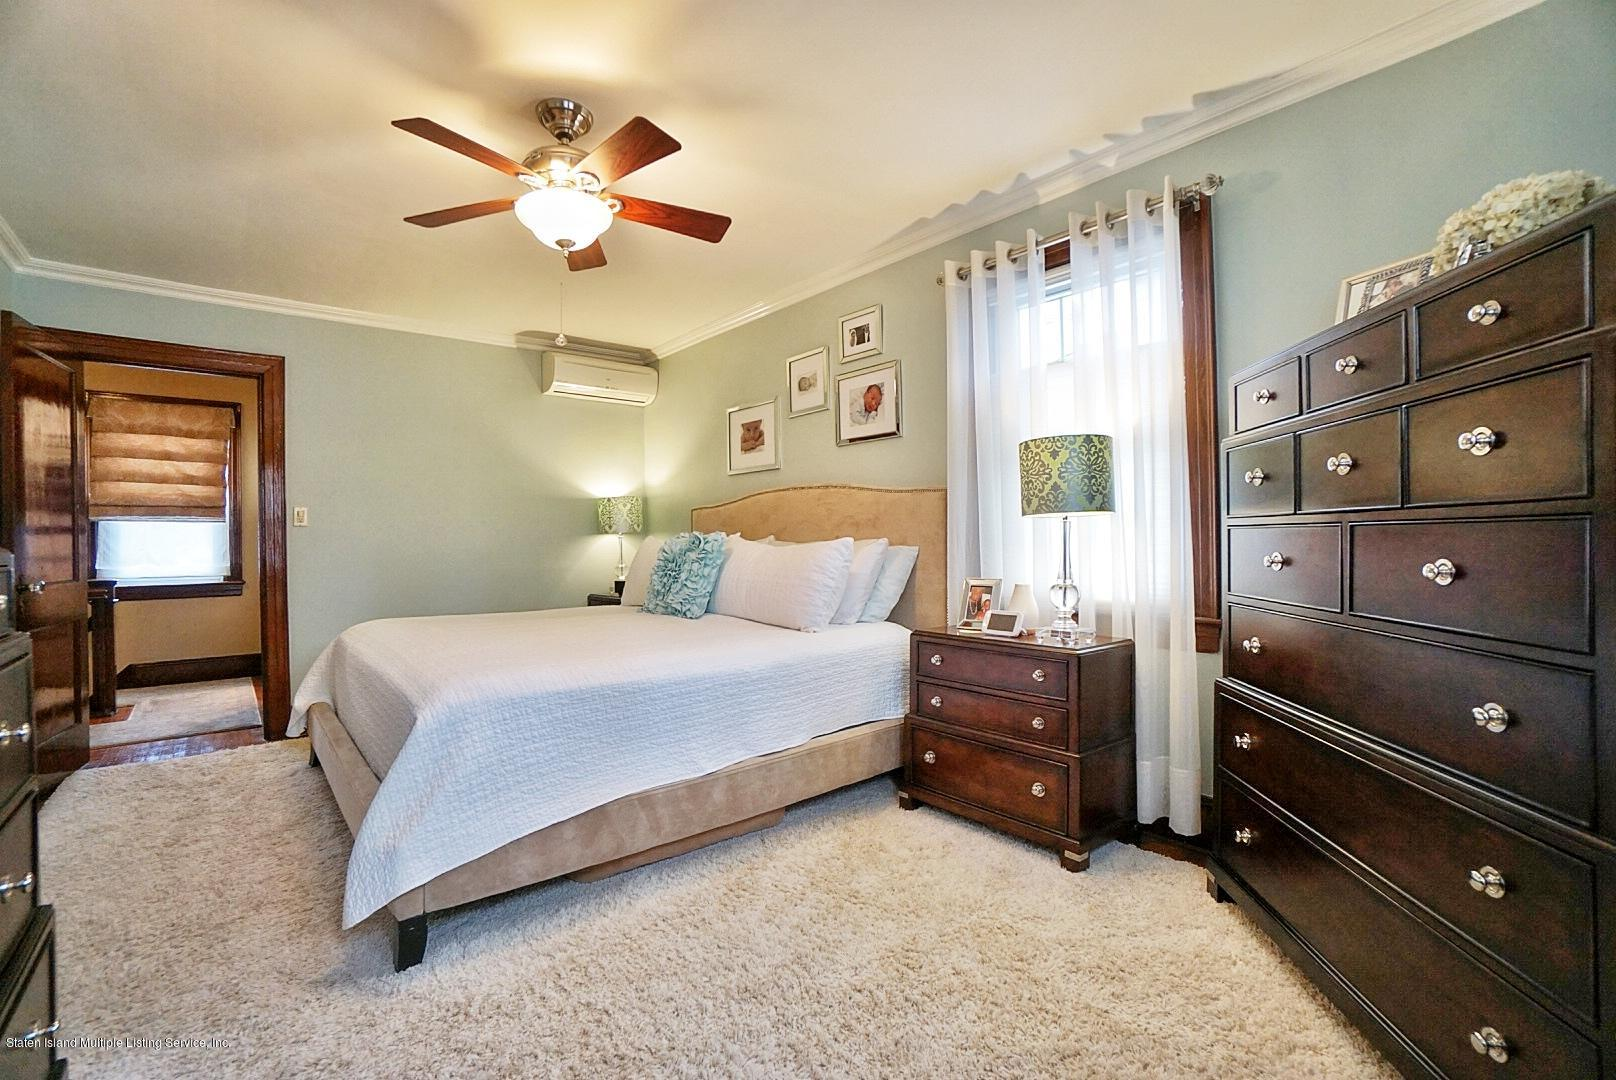 Single Family - Detached 171 Keiber Court  Staten Island, NY 10314, MLS-1127425-39